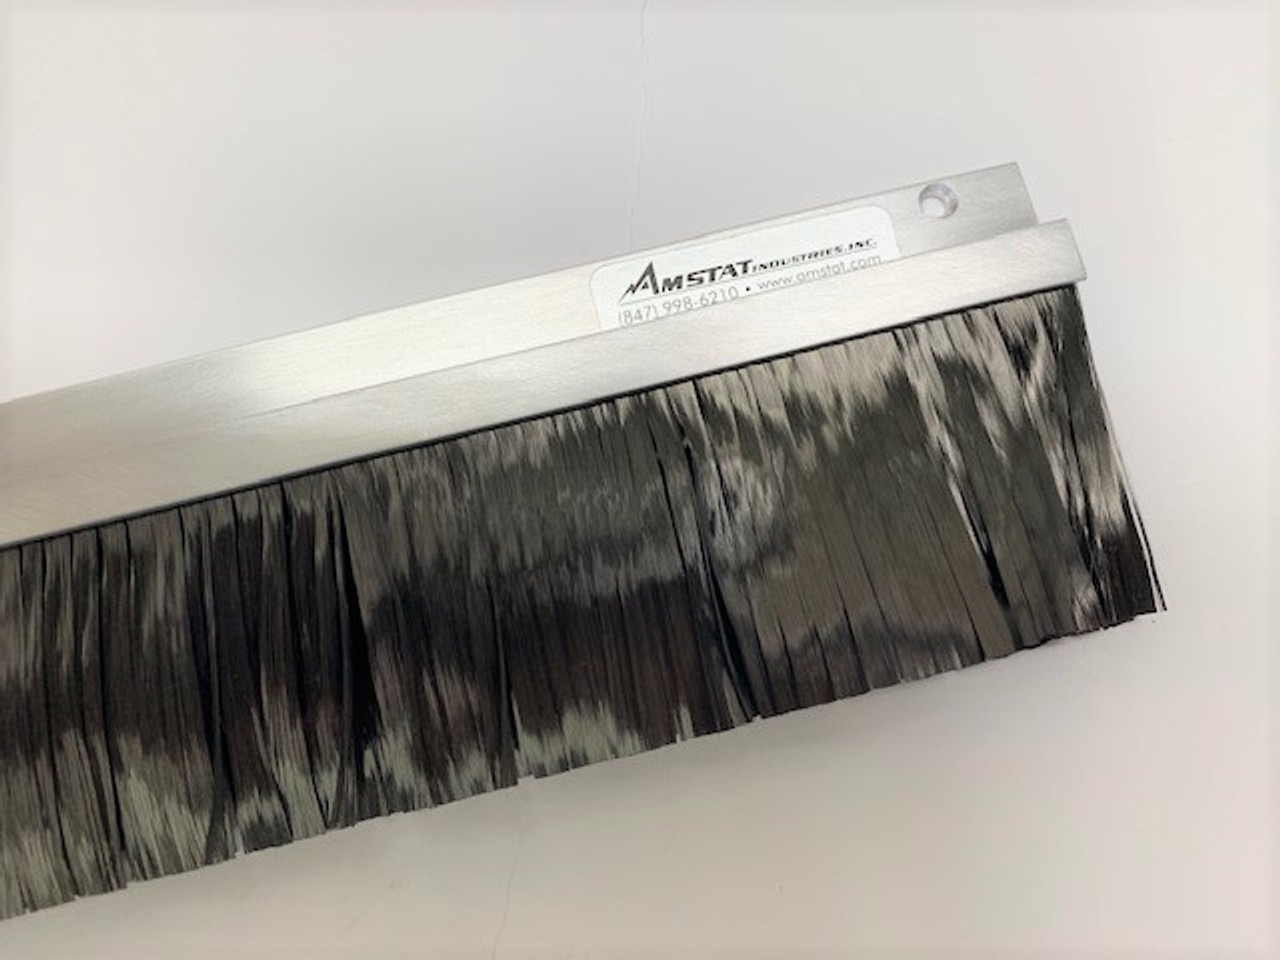 Carbon Fiber Brushes (50mm bristles) - $6.00/inch